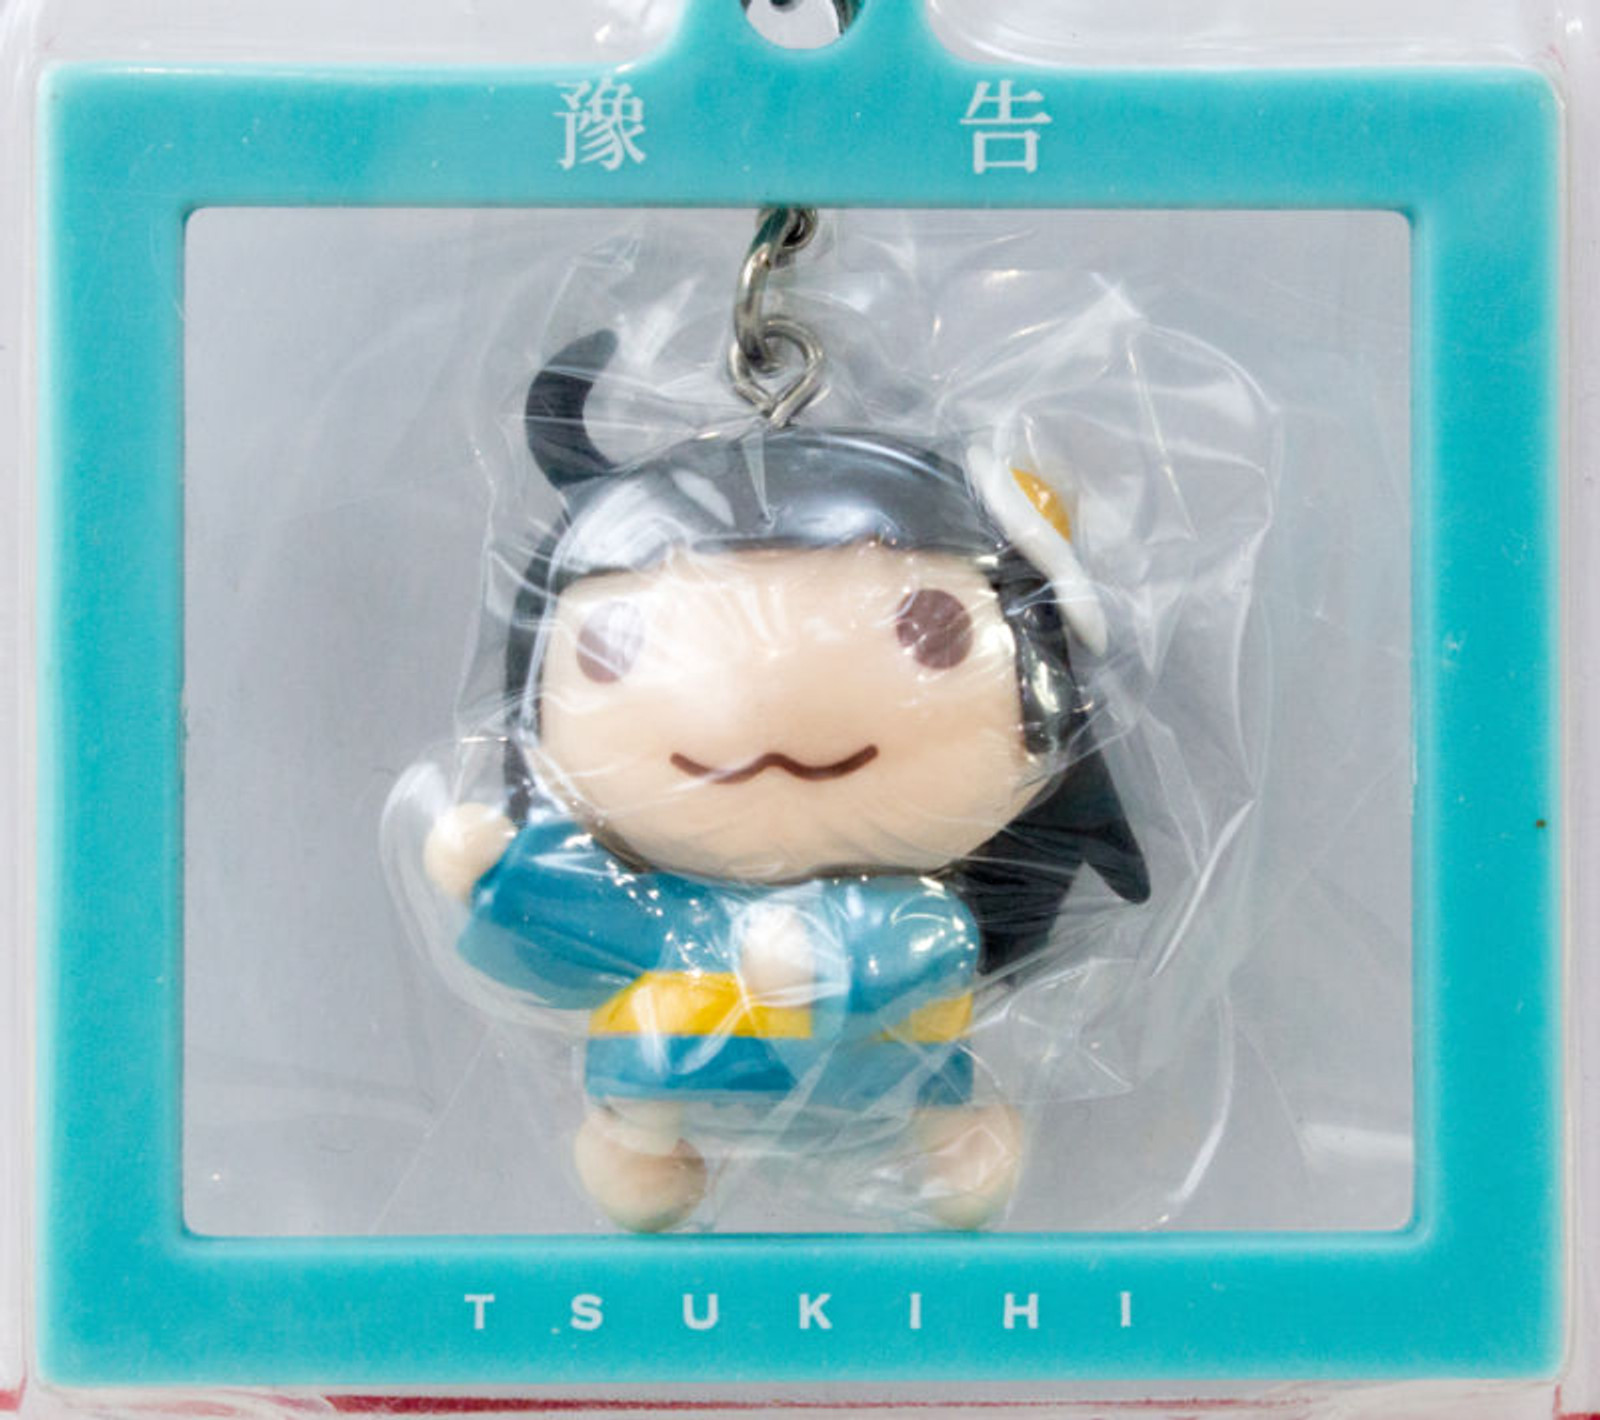 Bakemonogatari Tsukihi Araragi Mascot Figure Strap Banpresto JAPAN ANIME MANGA